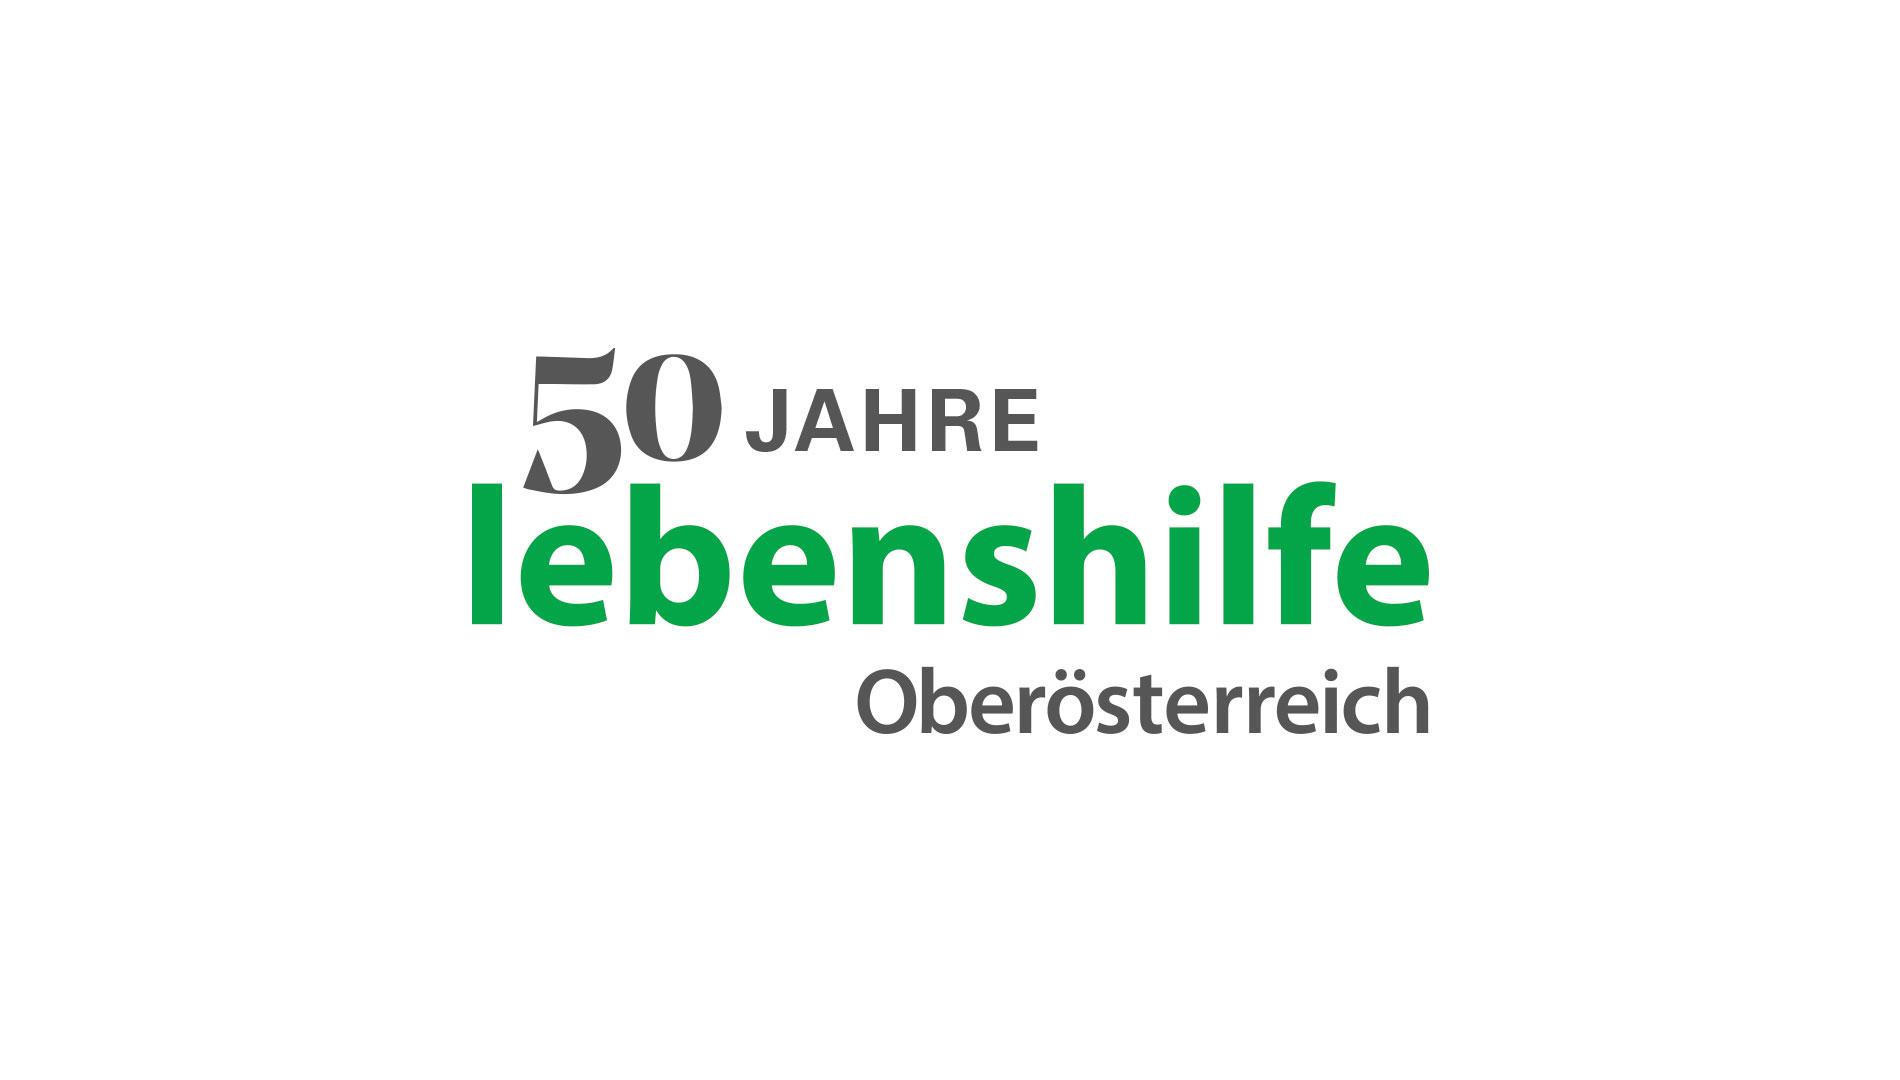 djw-lebenshilfe-signet-50jahre